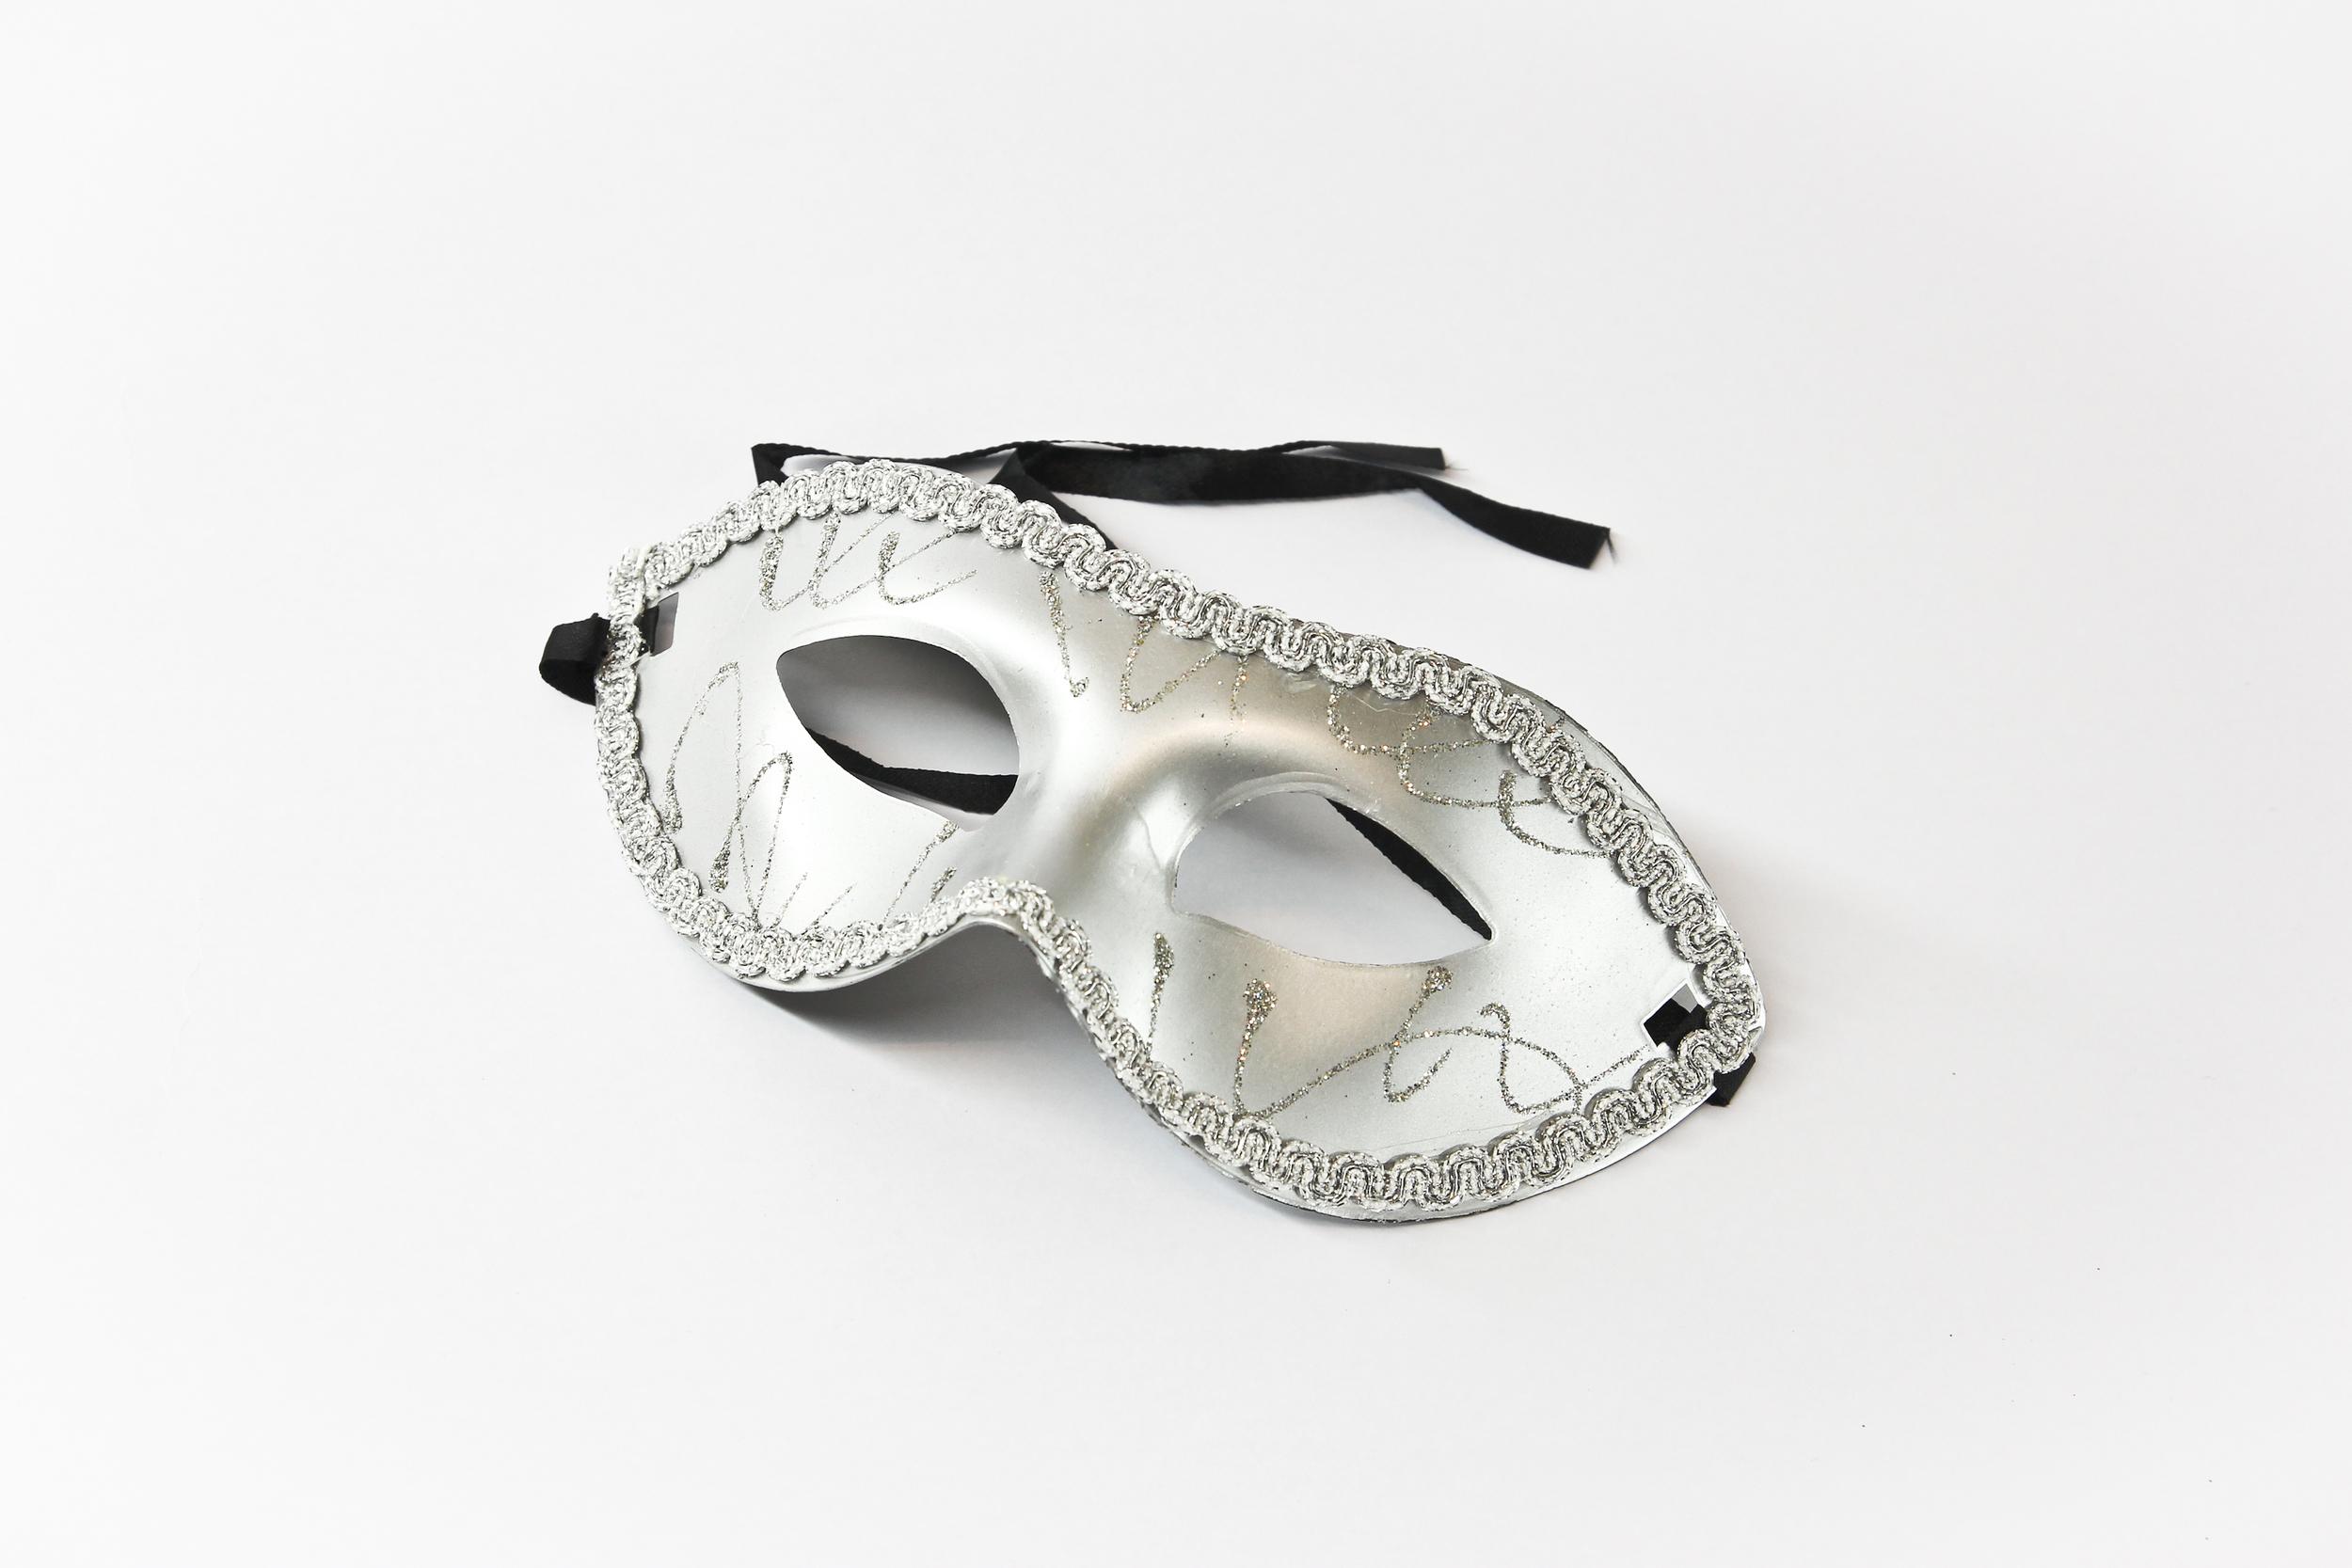 'One Seven' (sauna) event mask